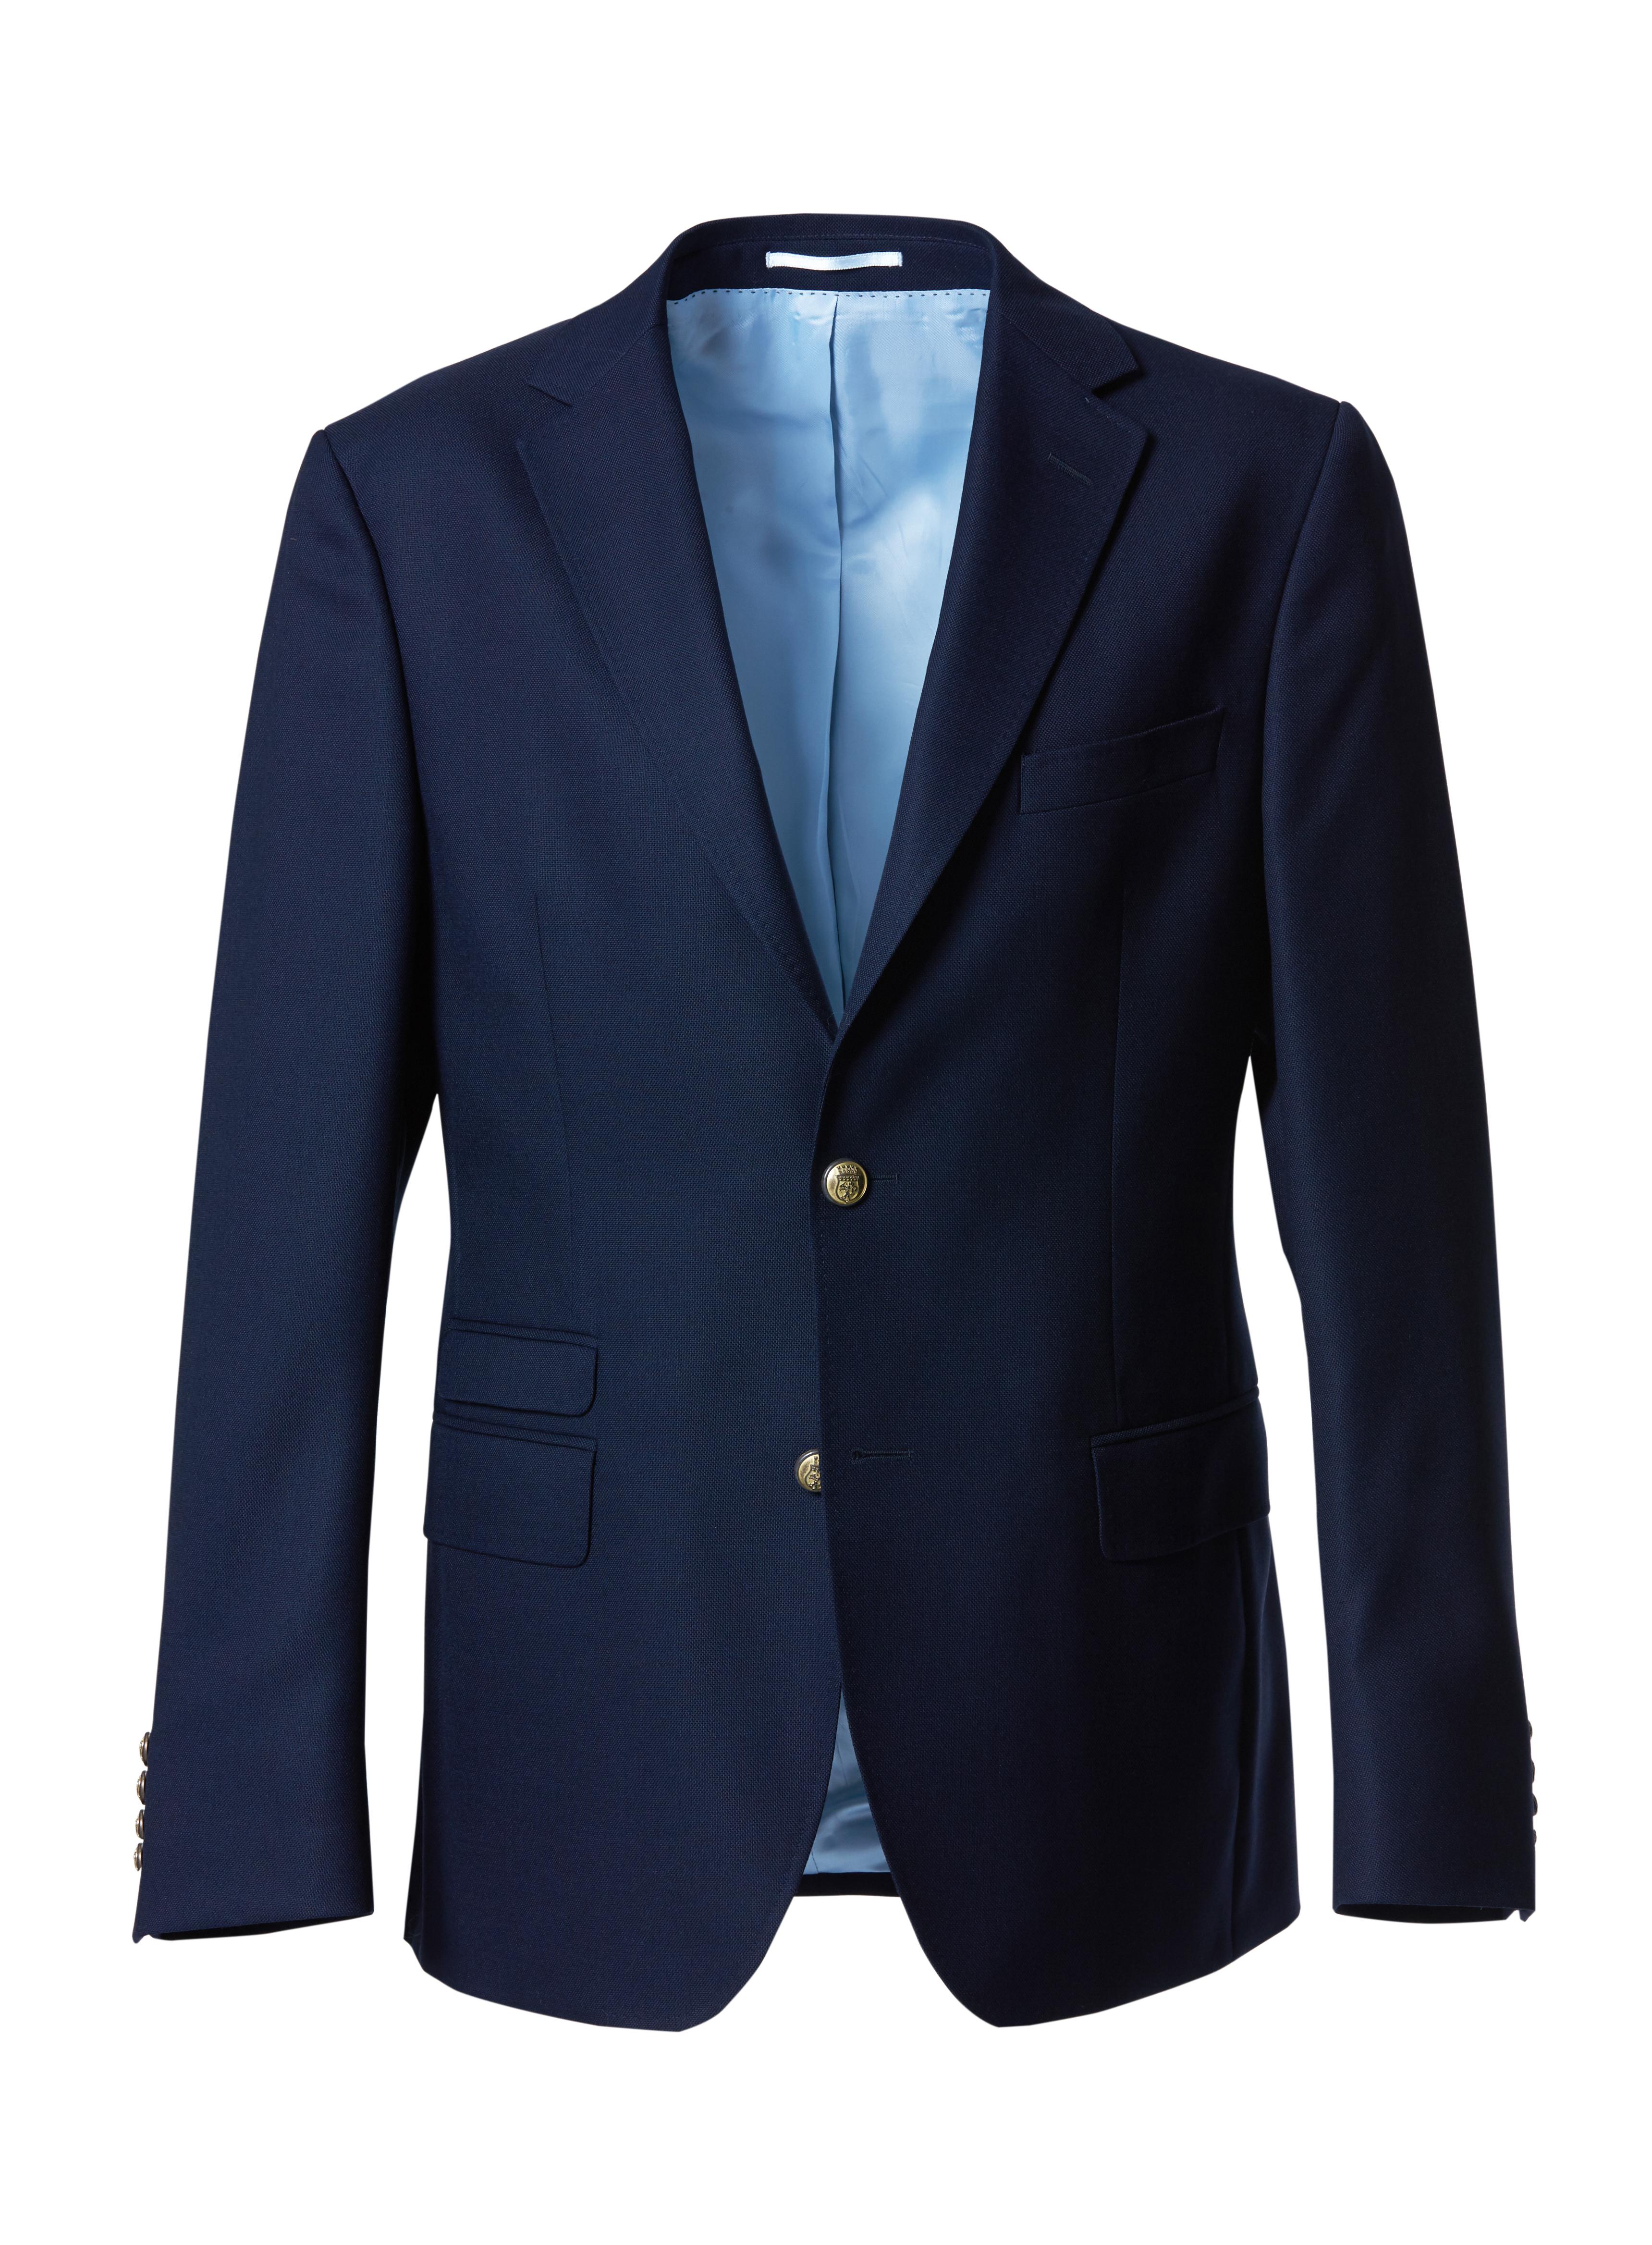 Colin, DarkBlue club Jacket from Loro Piana Cavaliere